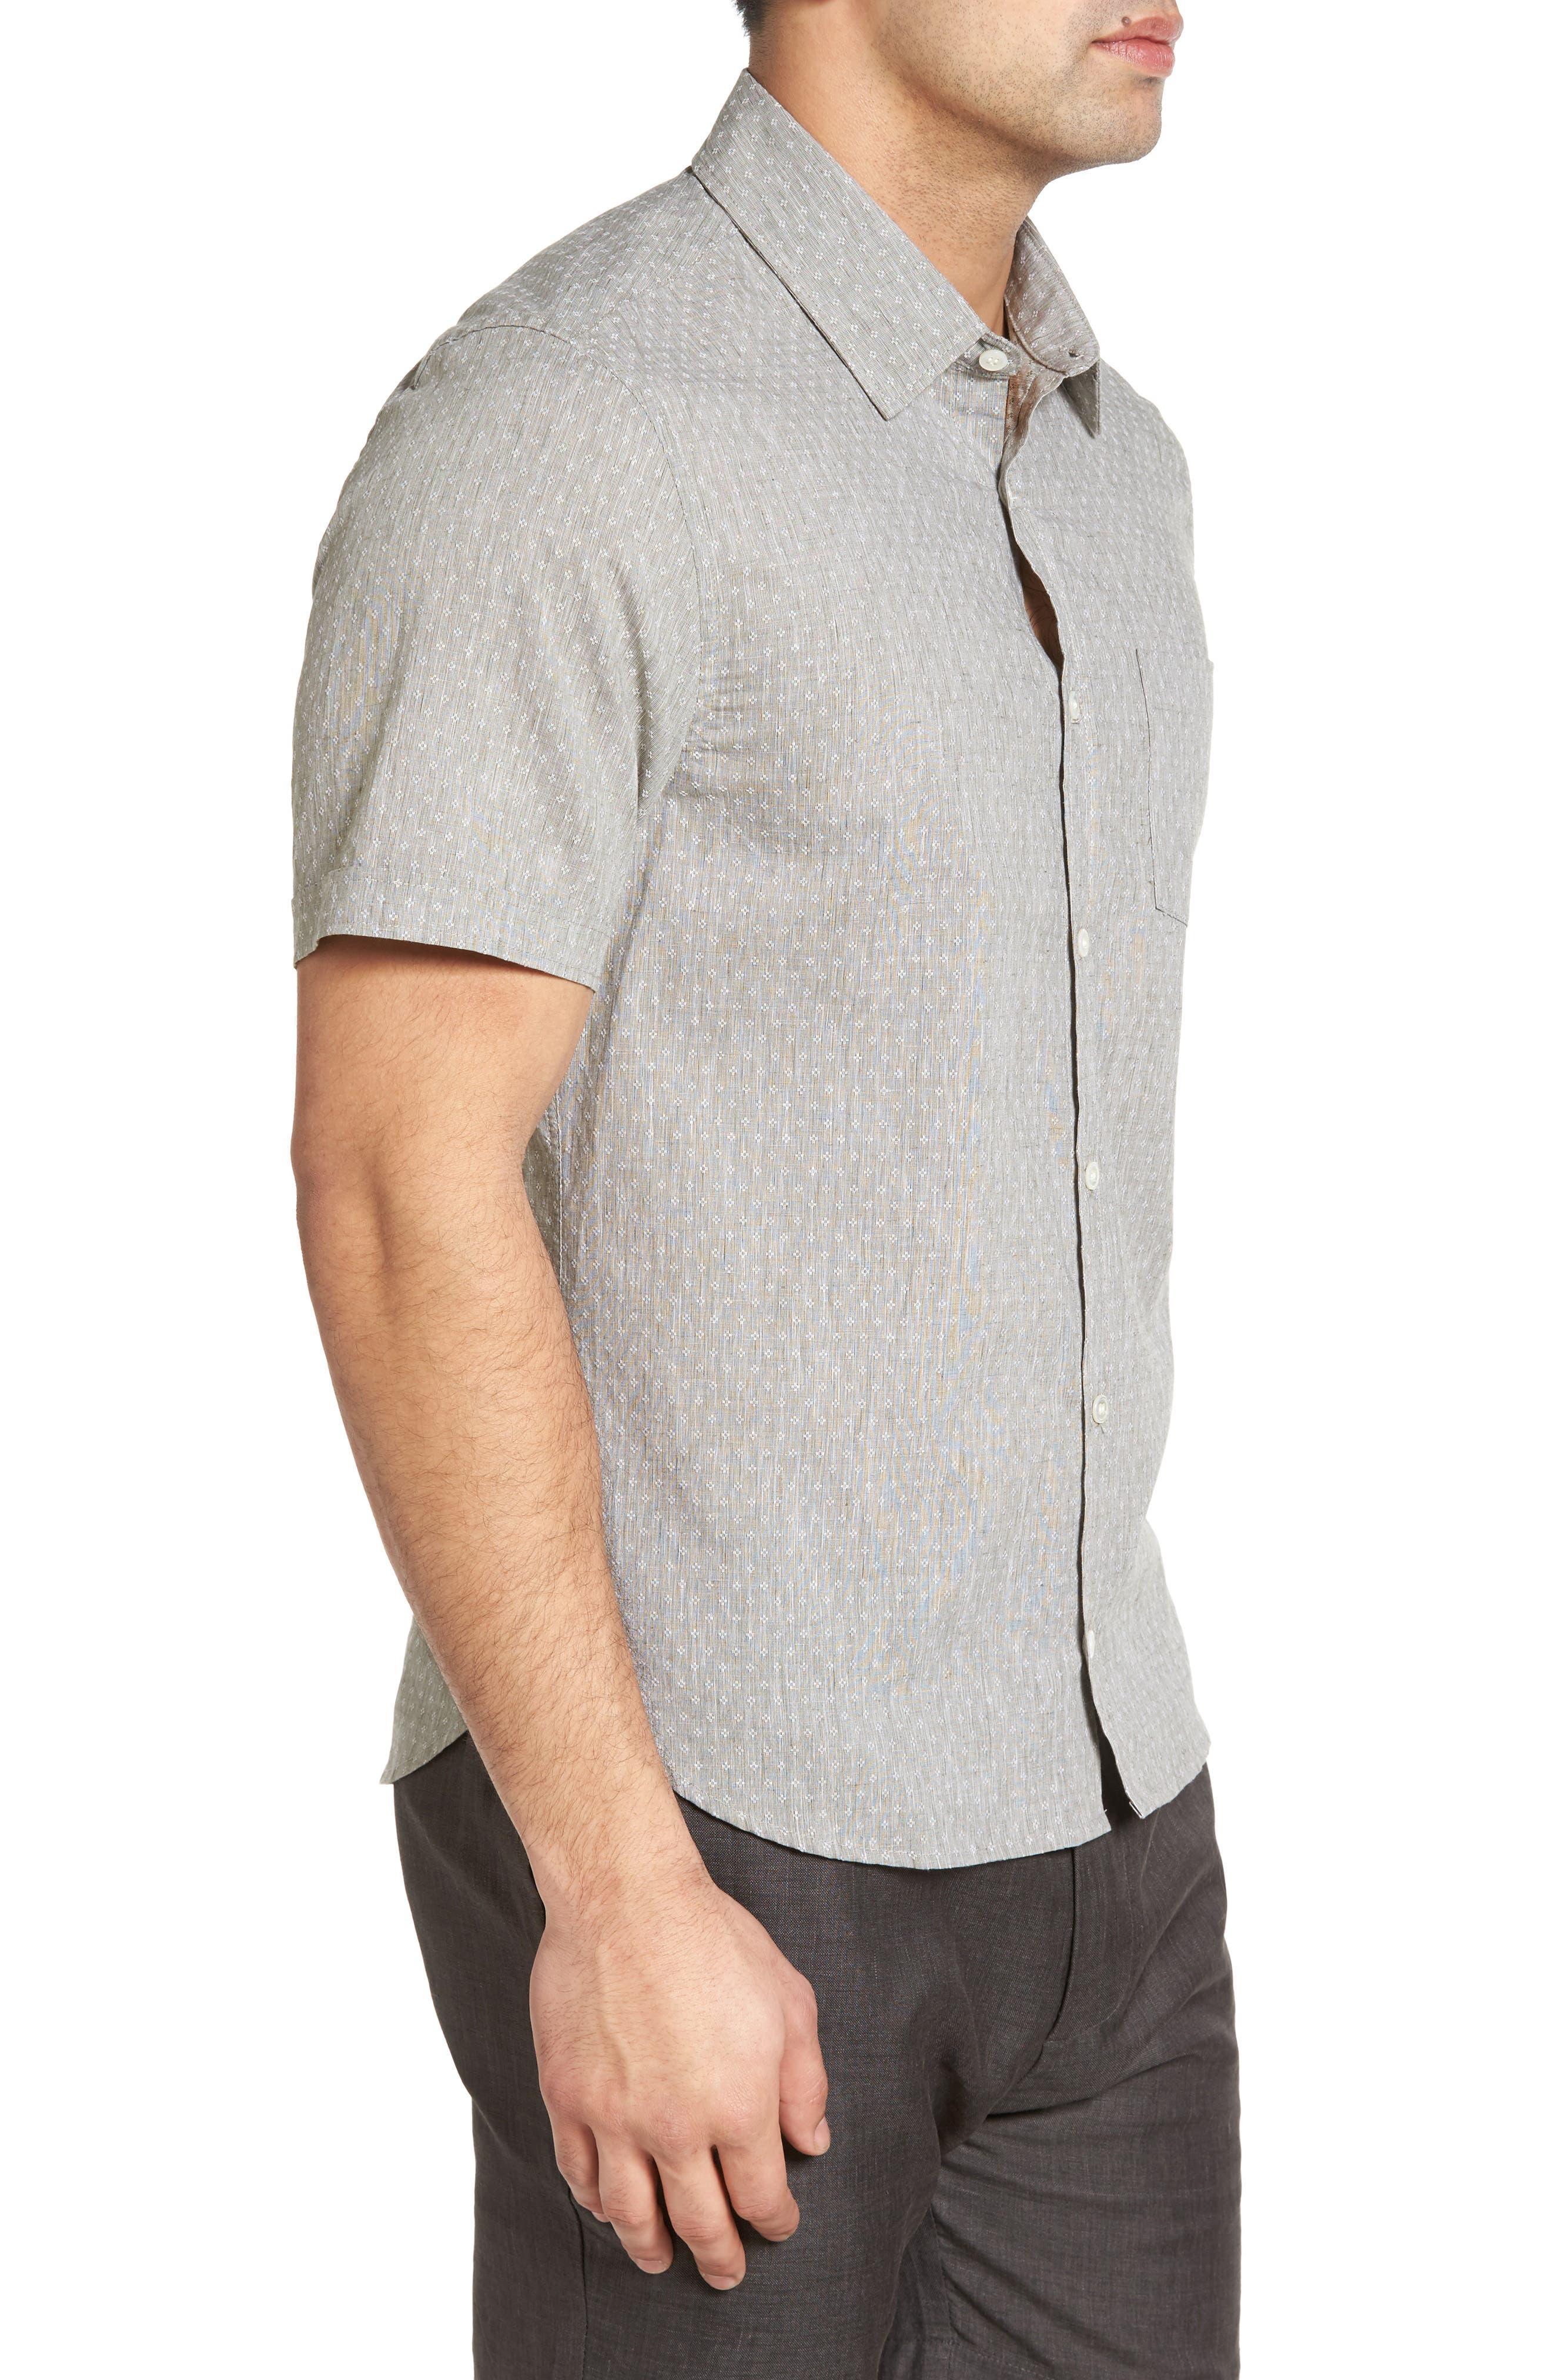 LANAI COLLECTION,                             Classic Fit Sport Shirt,                             Alternate thumbnail 3, color,                             310